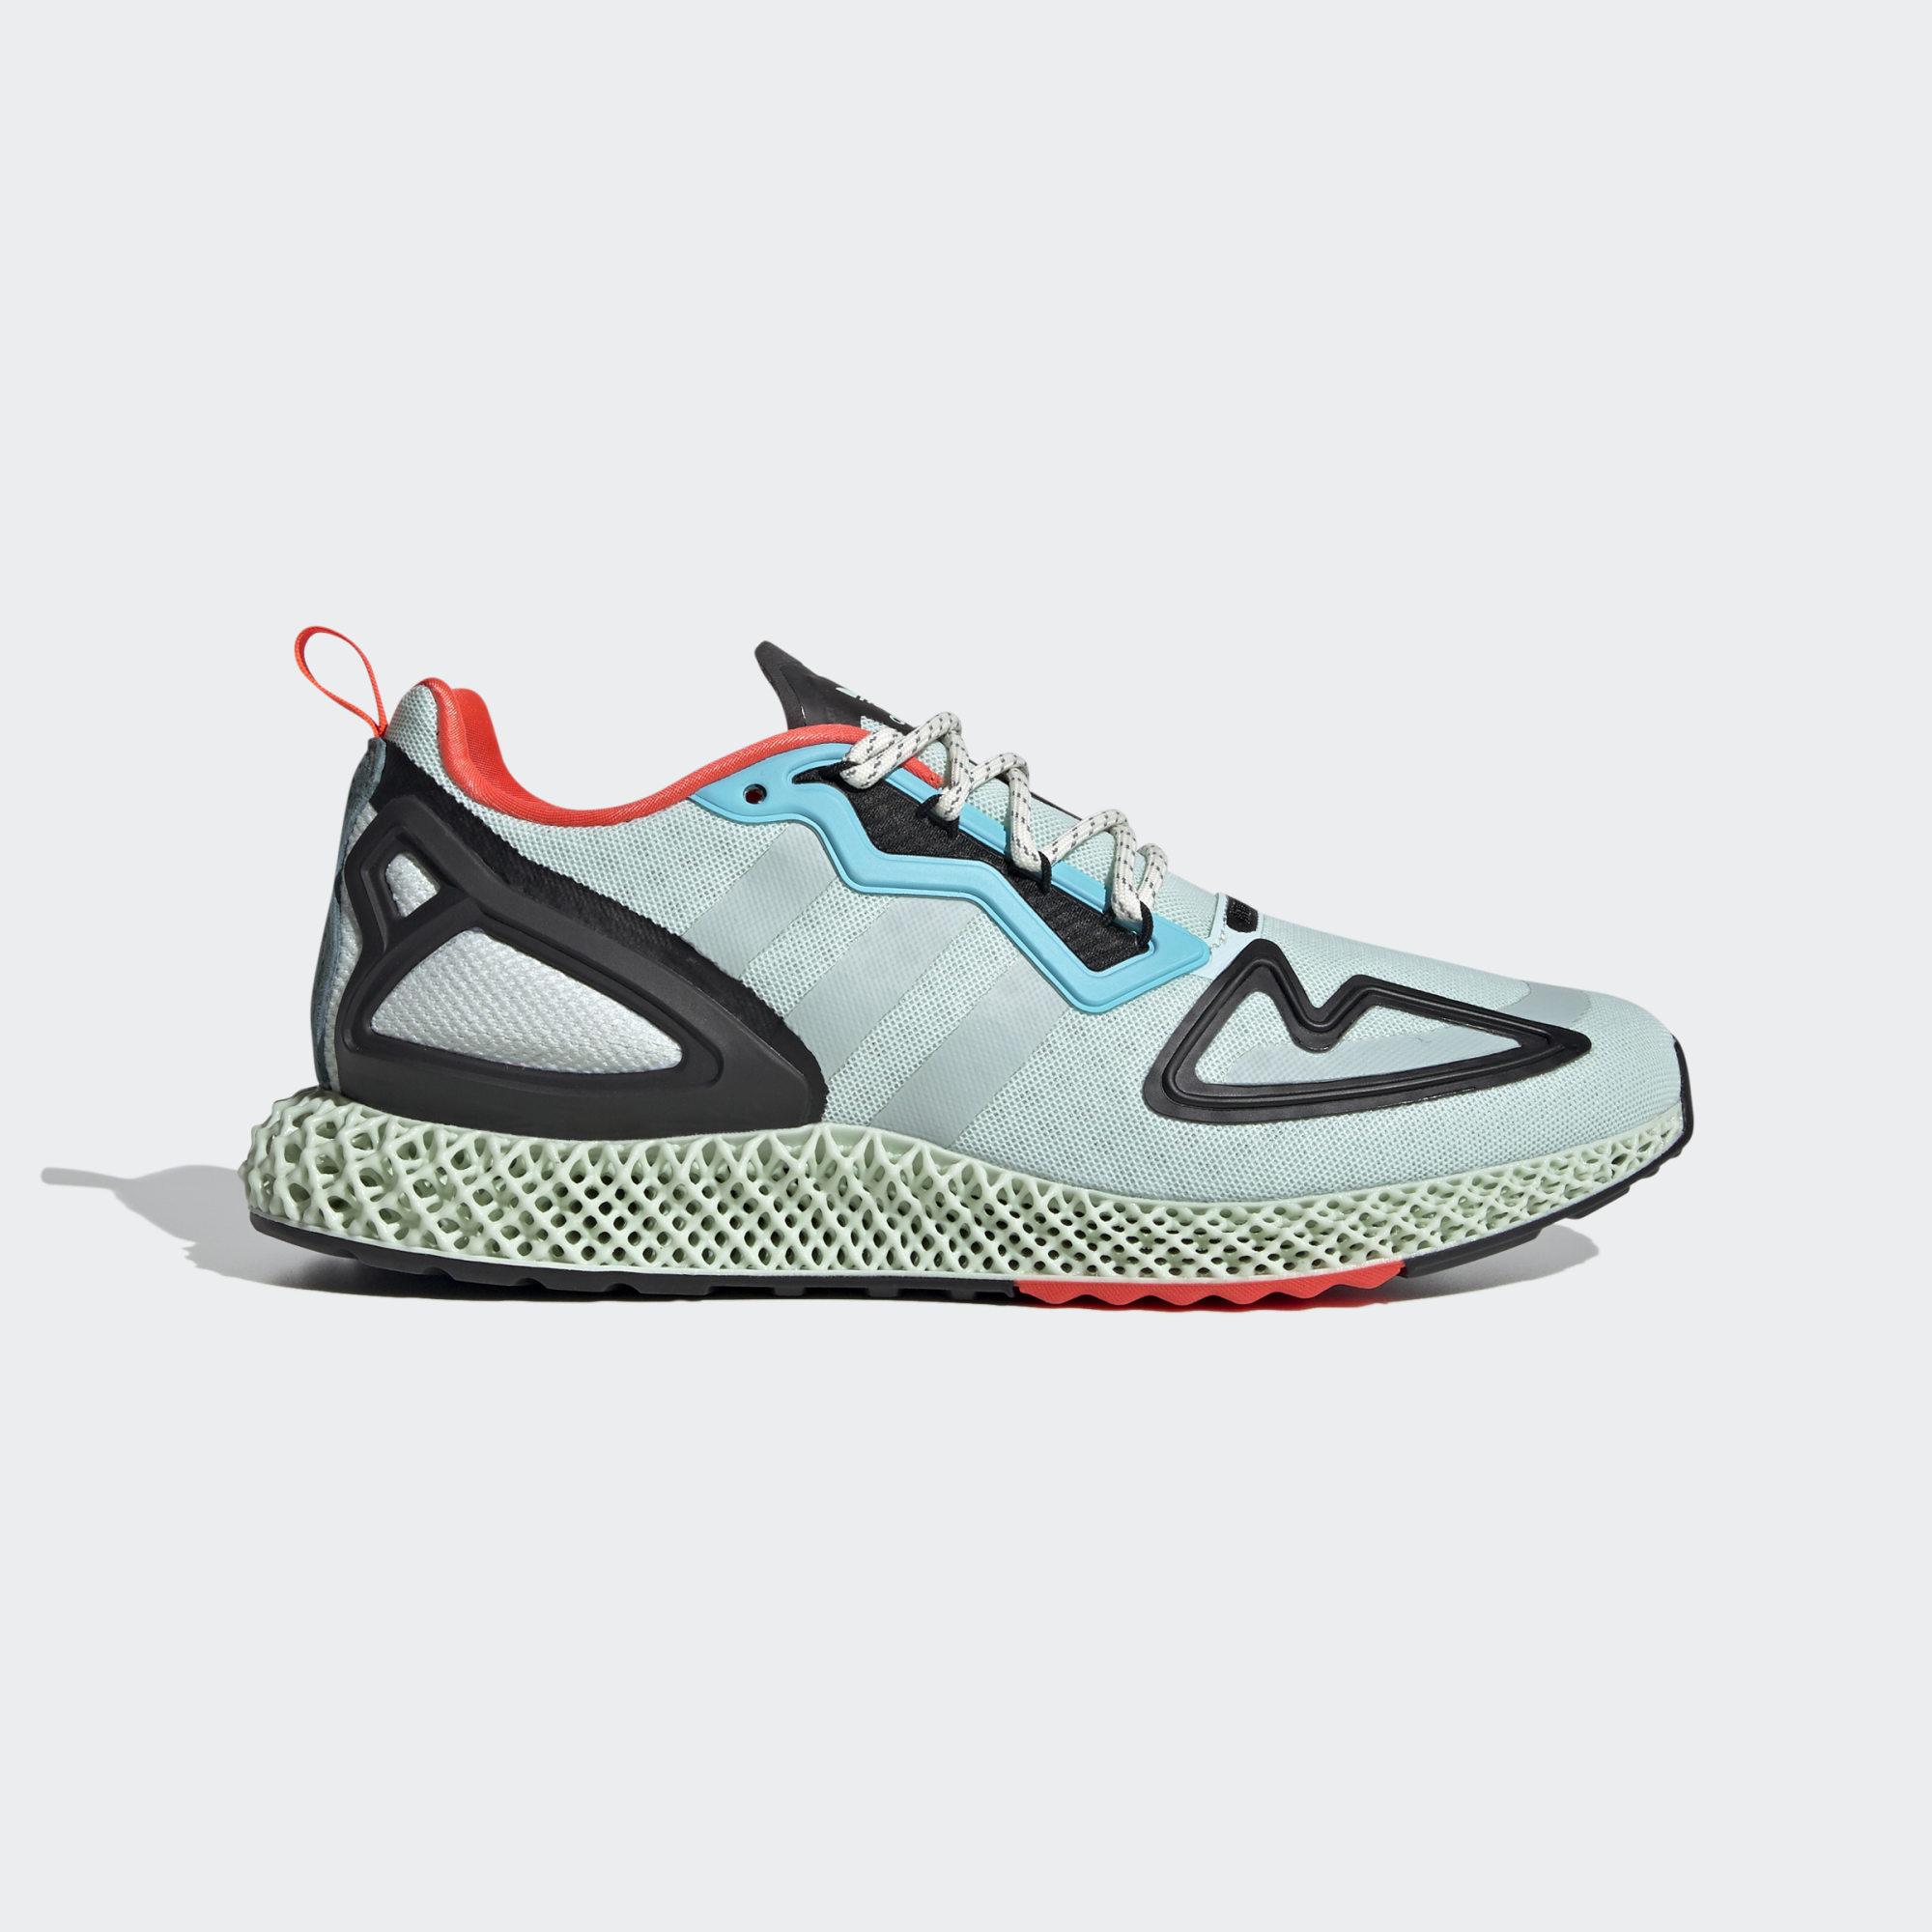 giay-sneaker-nam-adidas-zx-2k-4d-fv8500-raw-green-hang-chinh-hang